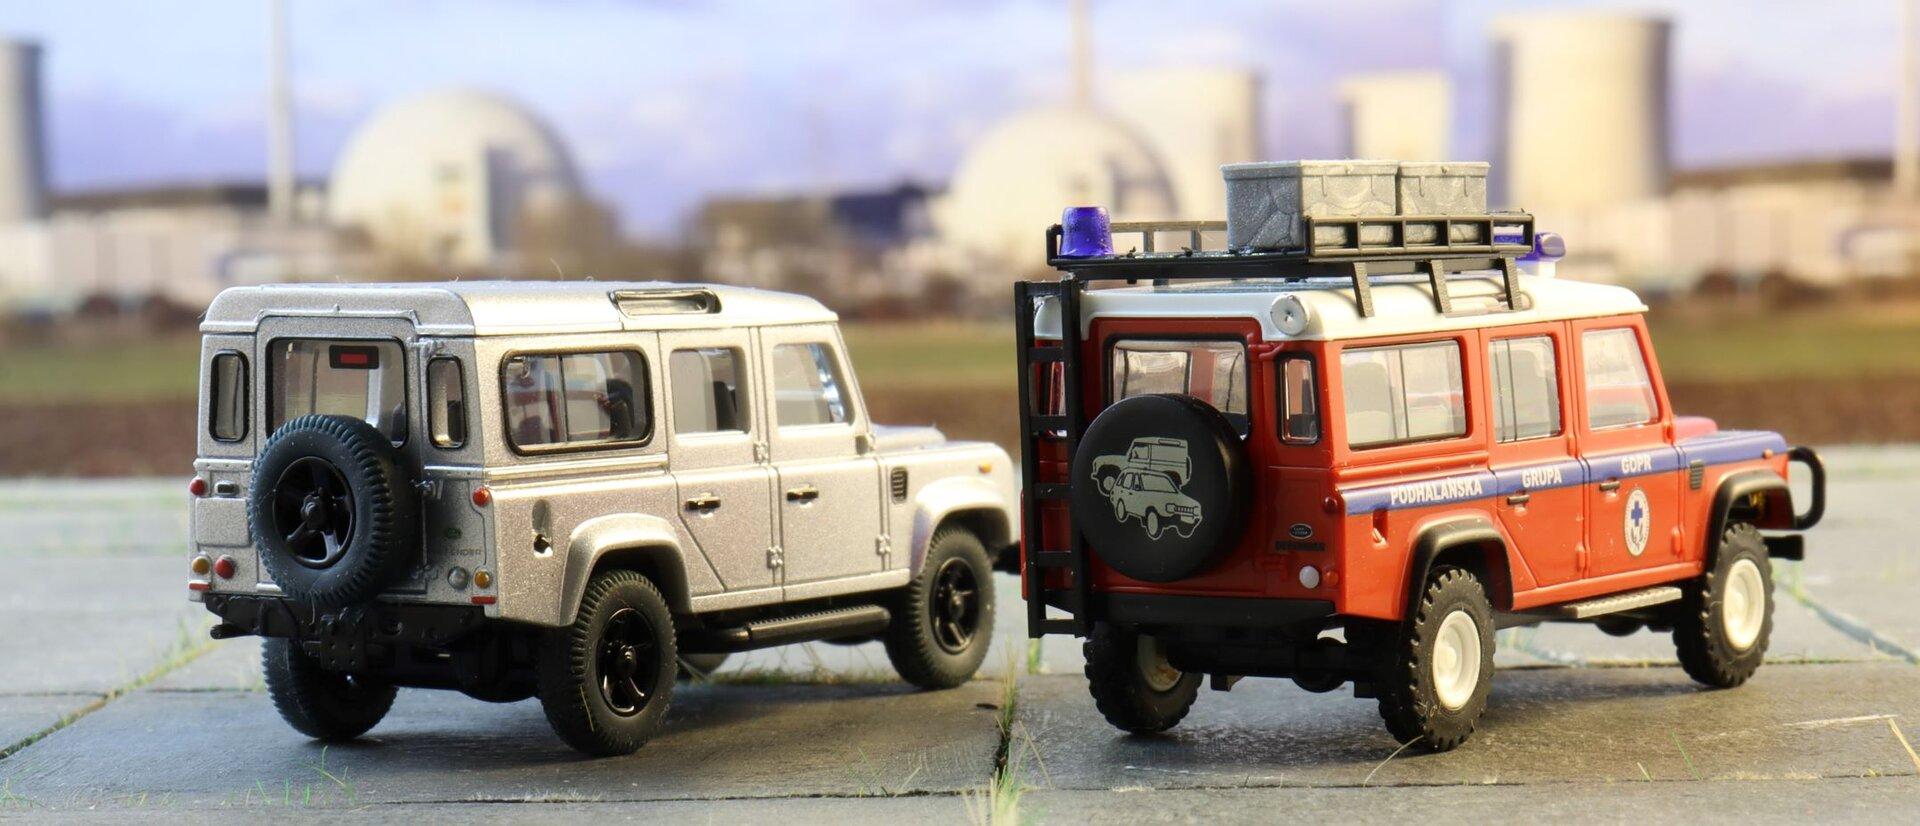 Land rover Defender Wiking 6.JPG